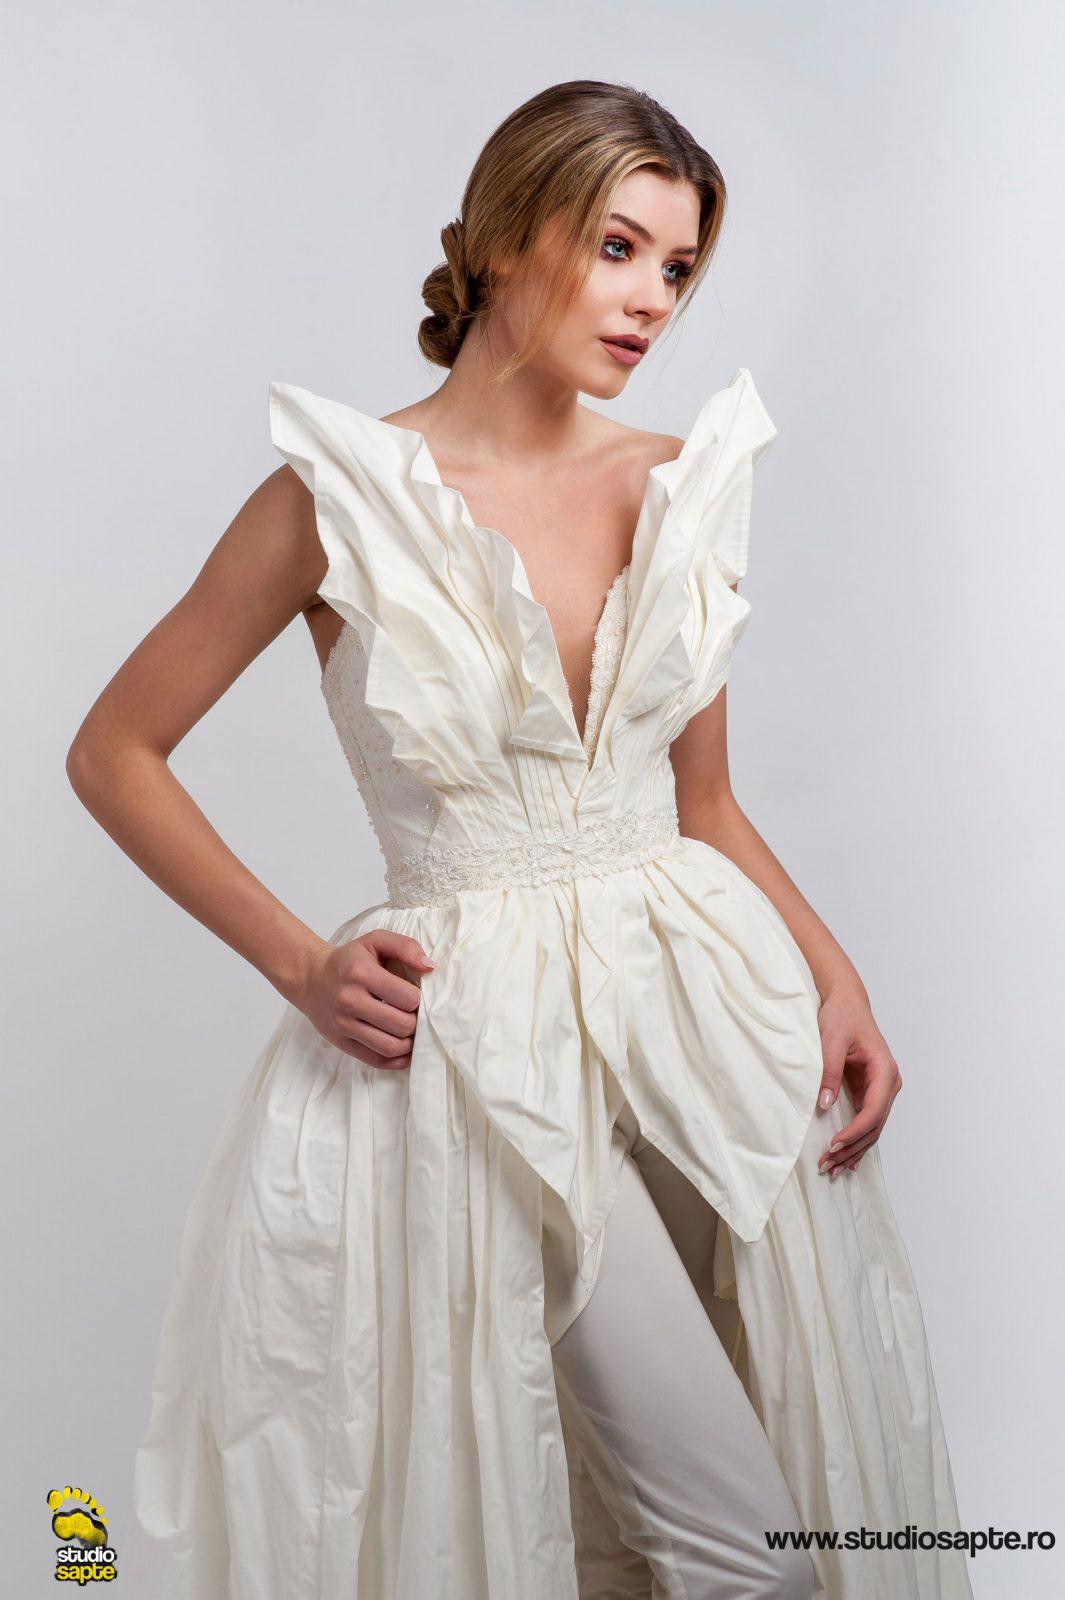 Rochie Mireasa Deosebita | Studio Foto | Moda